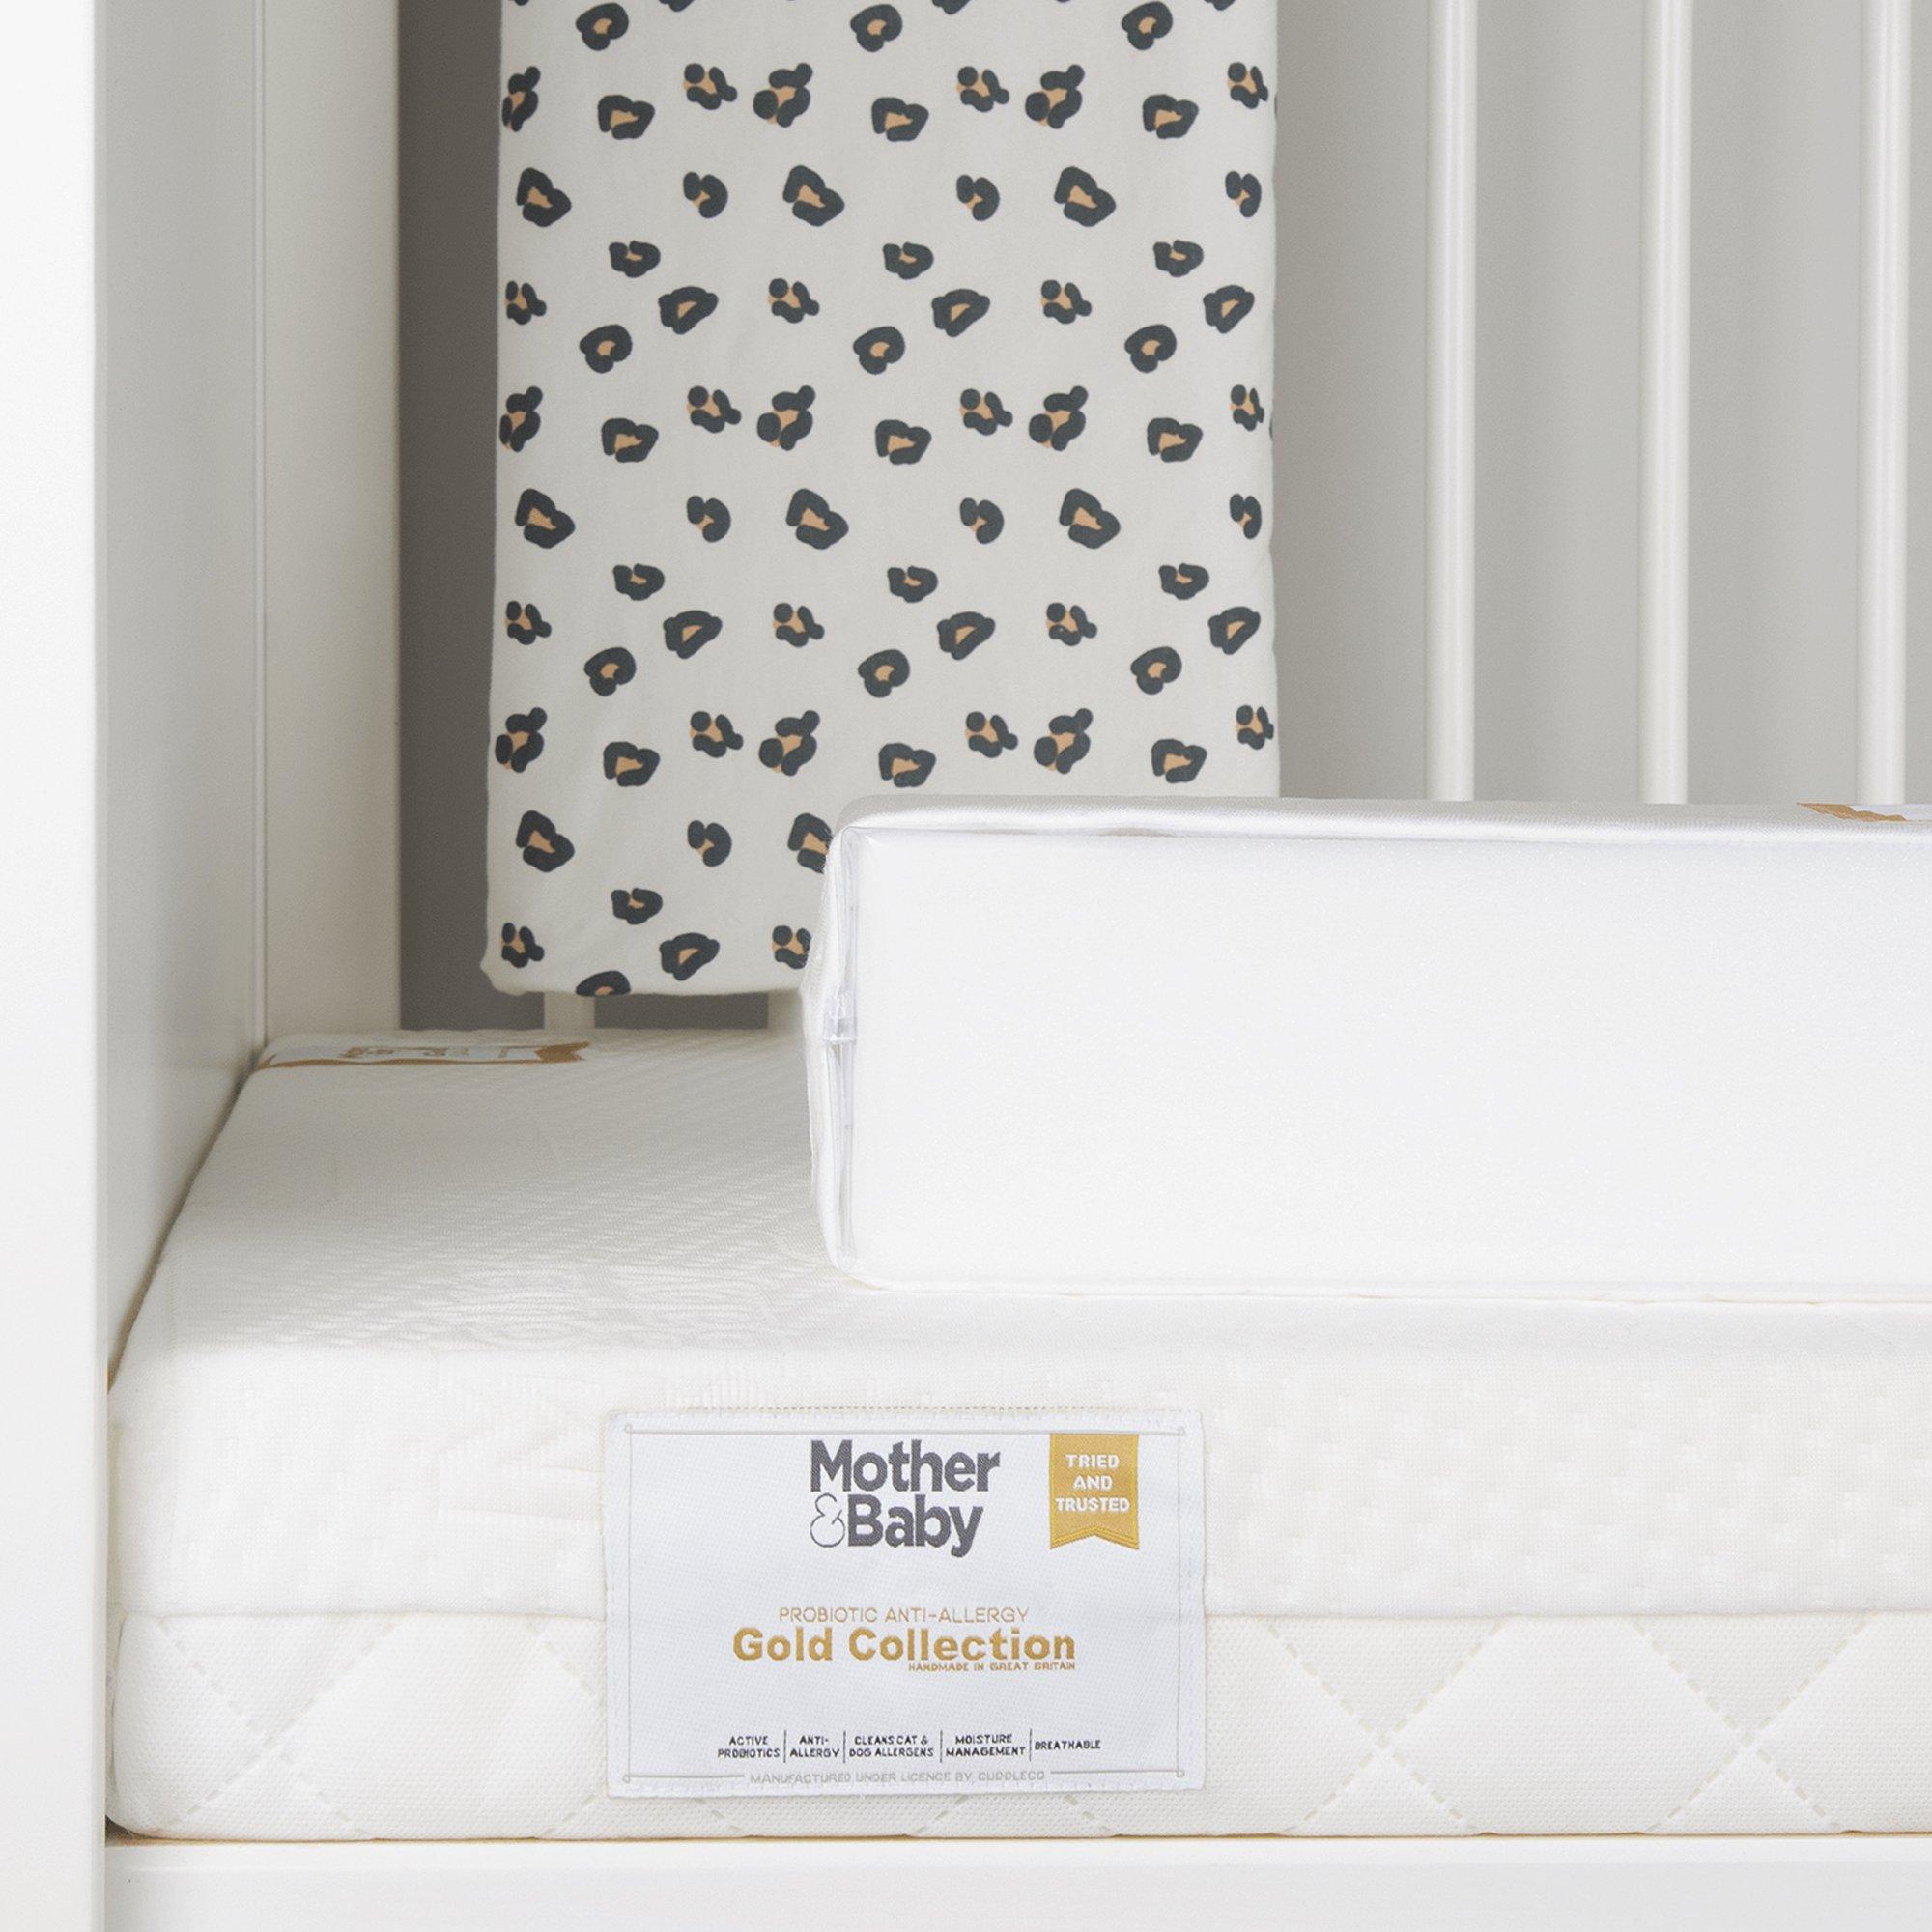 Mother&Baby 140 x 70cm Anti-Allergy Foam Cot Bed Mattress